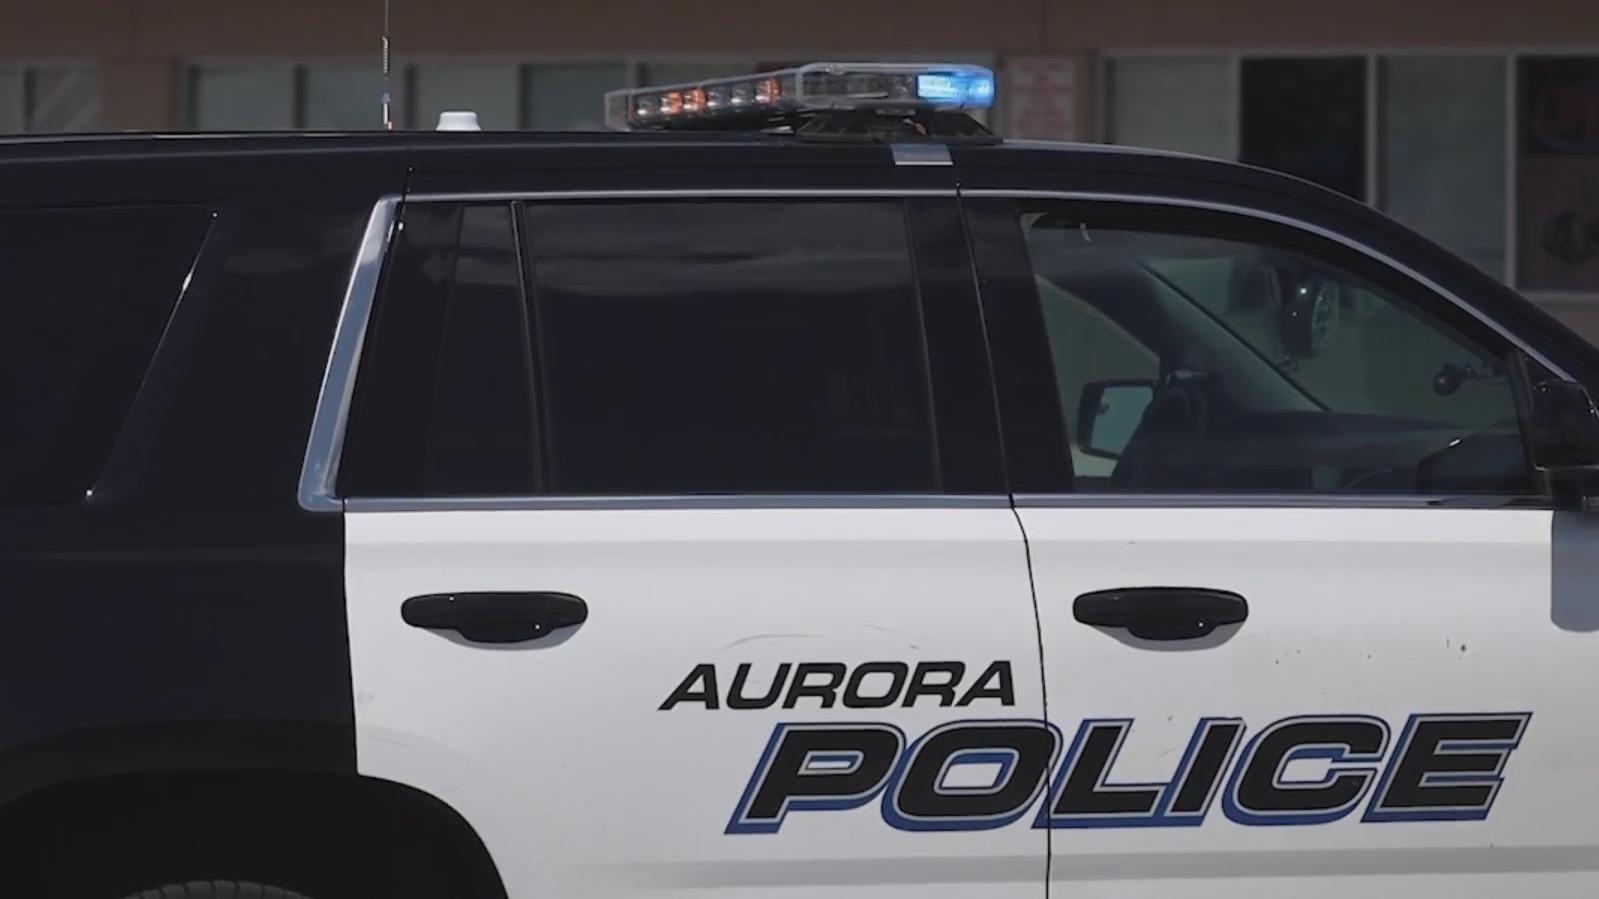 An Aurora Police Department SUV.